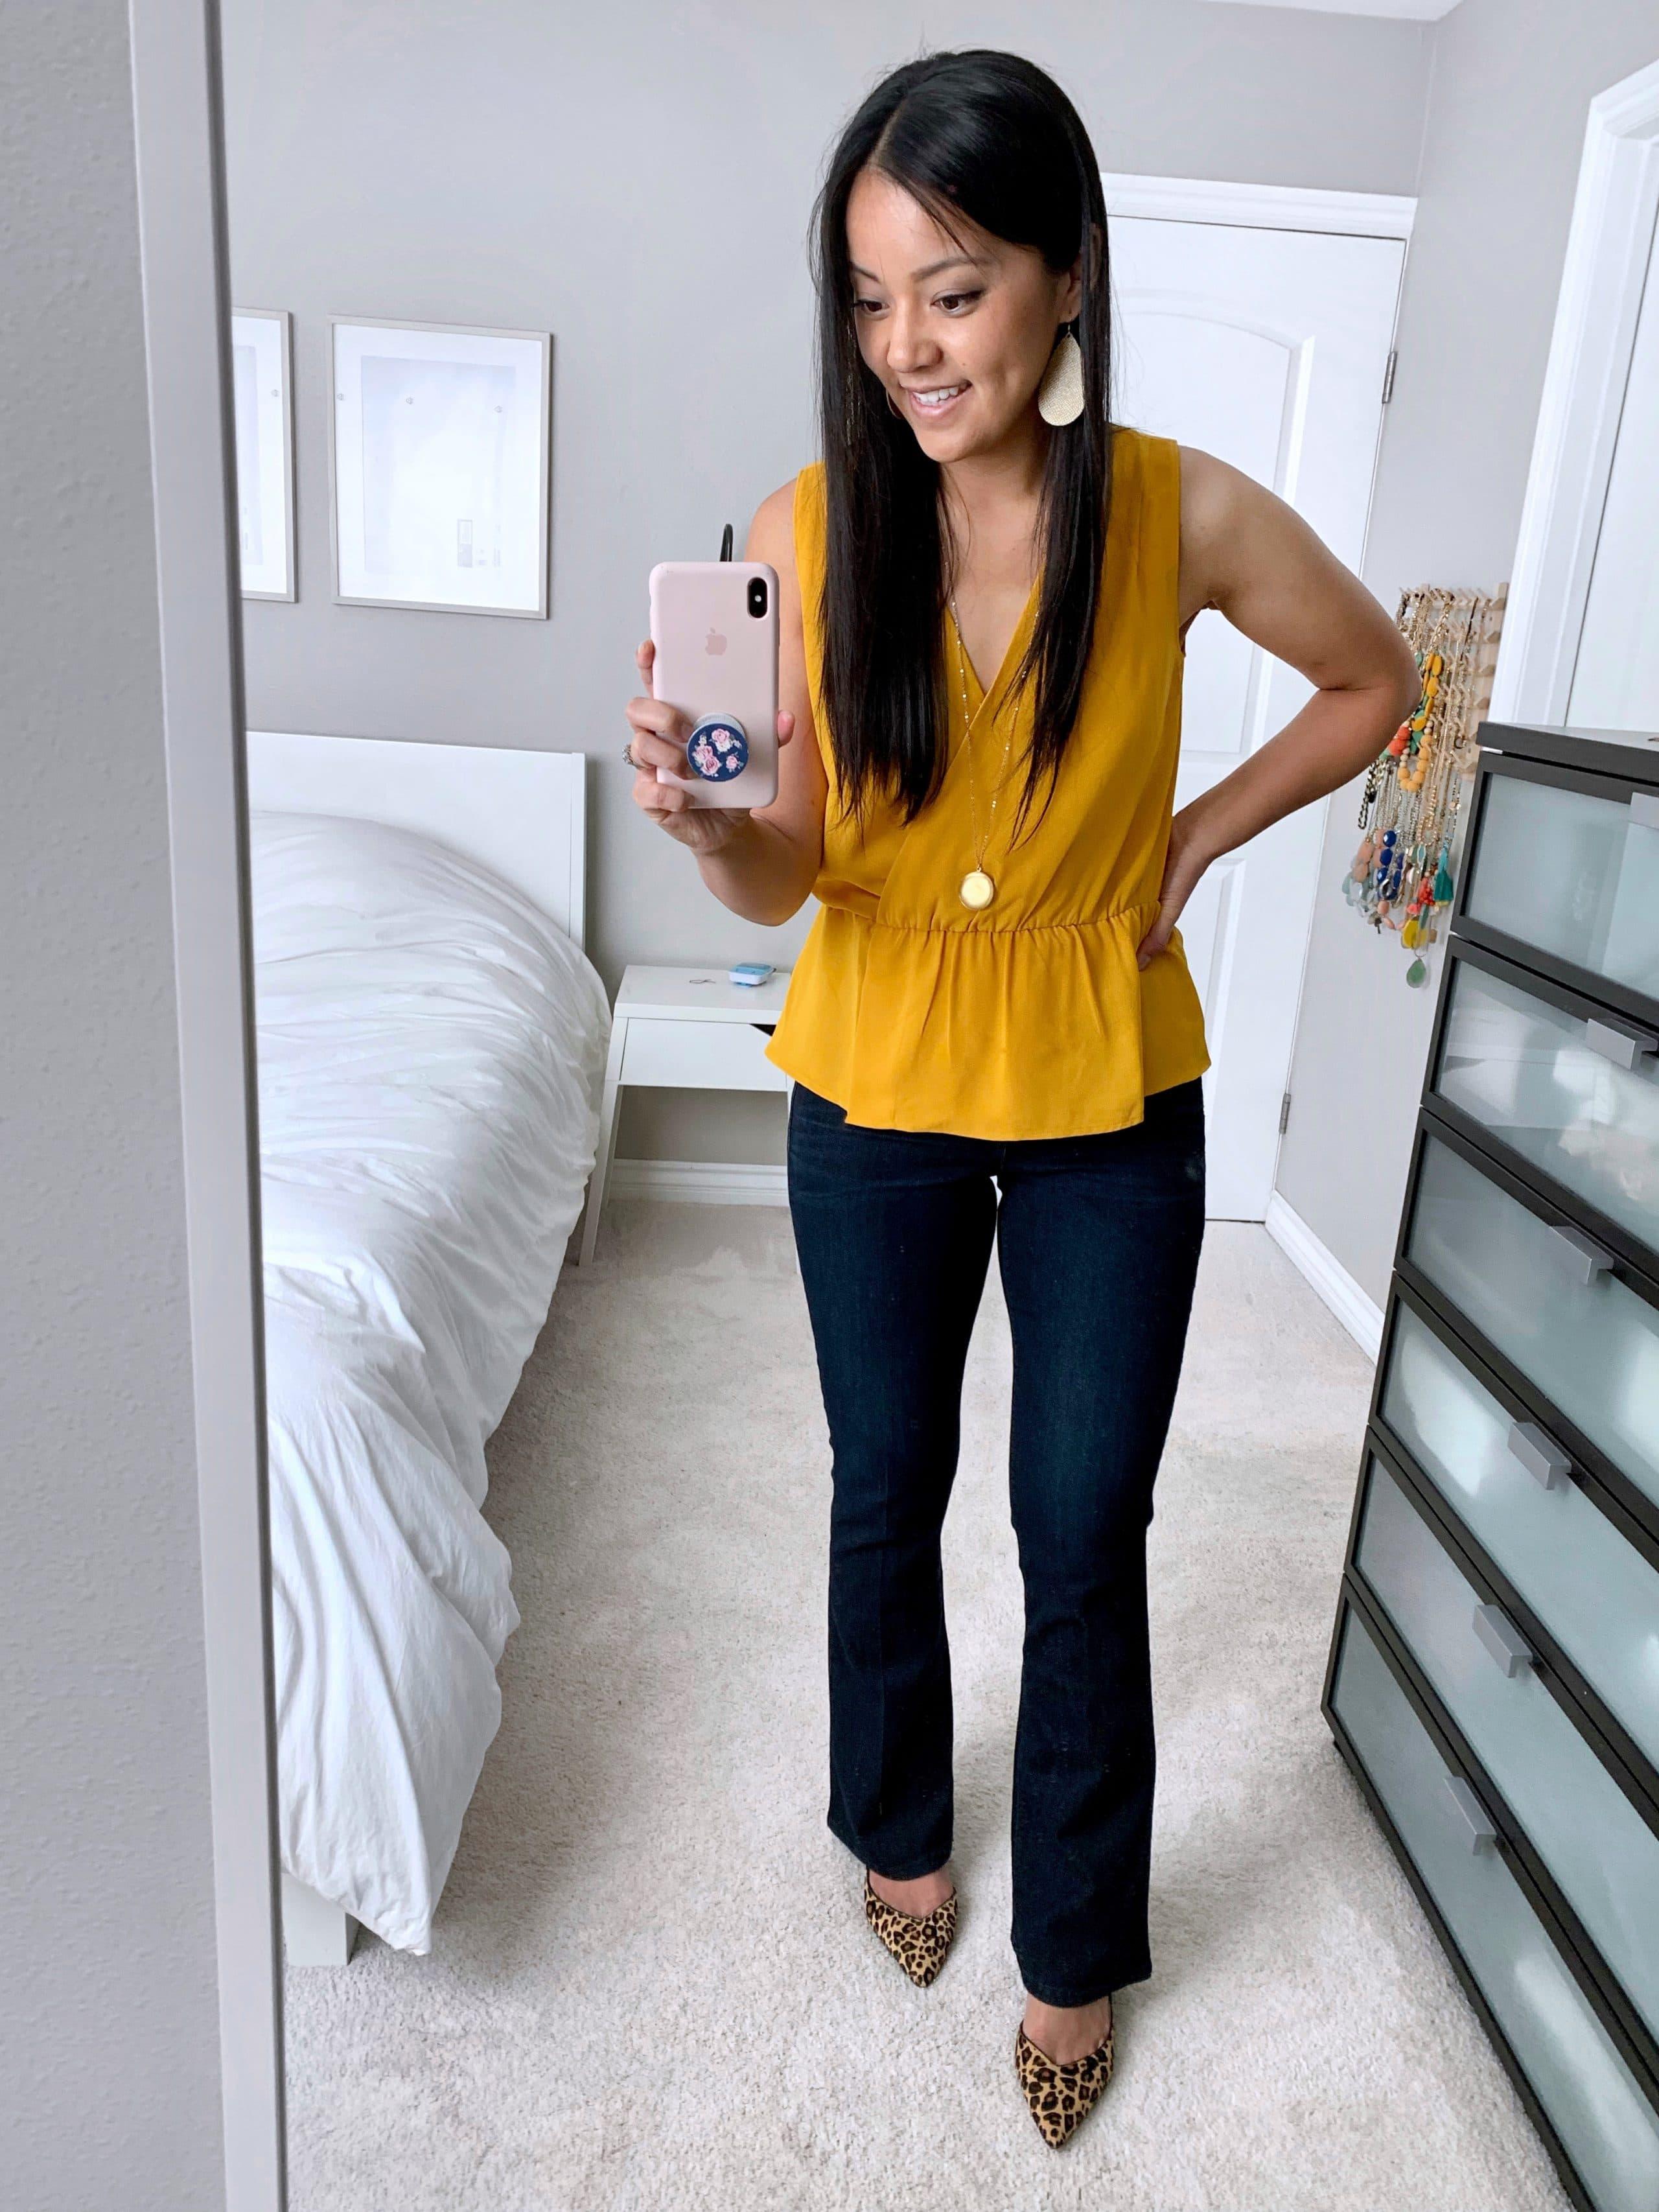 bootcut jeans + yellow top + leopard print pumps